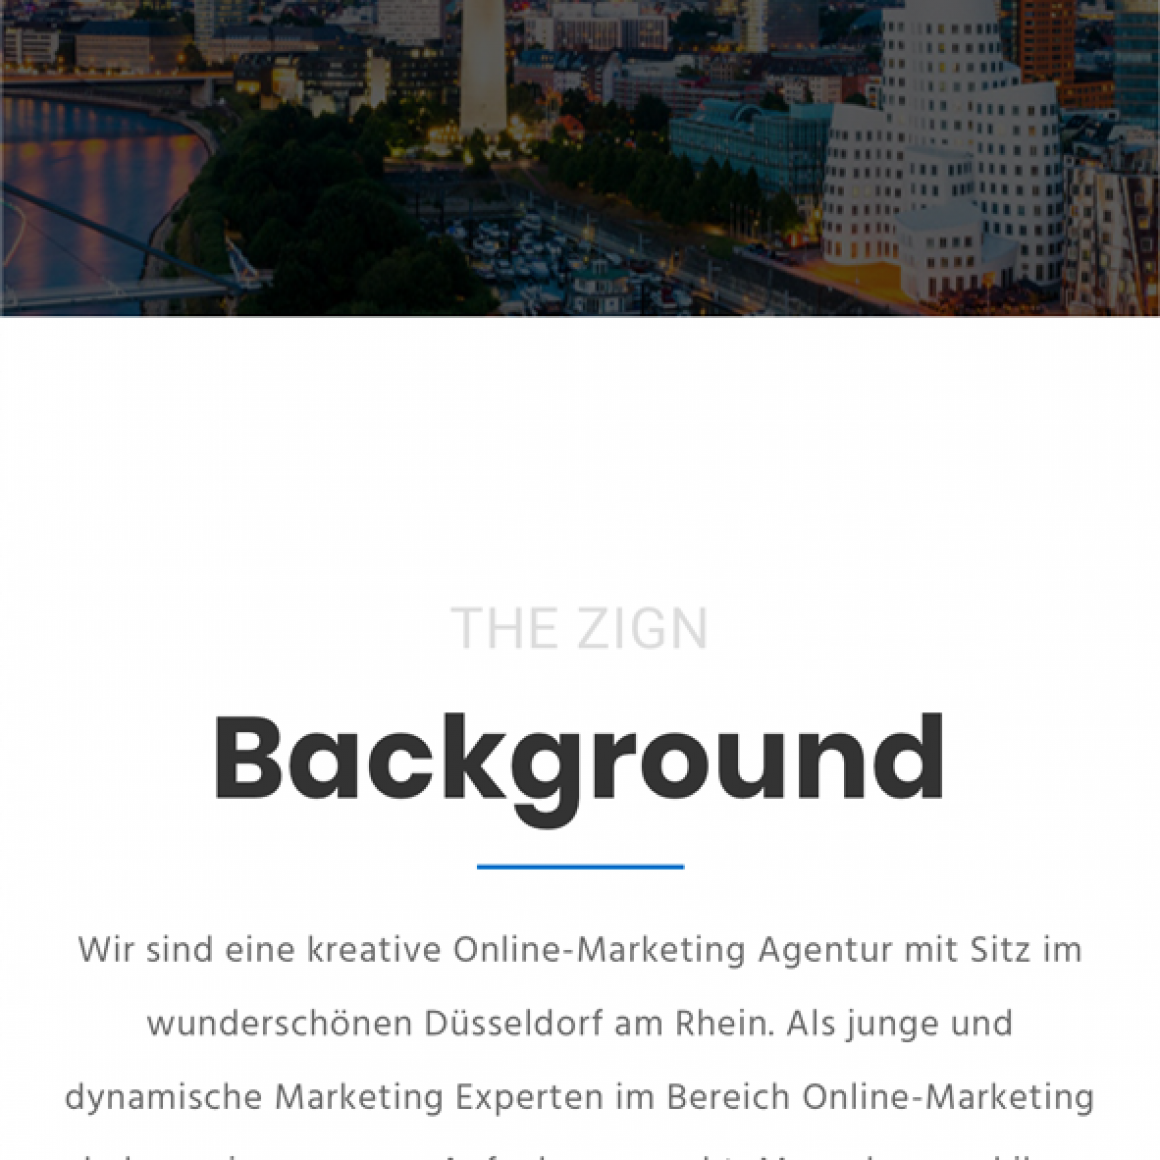 TZ_Referenz_Mobile-1160x1160 the zign